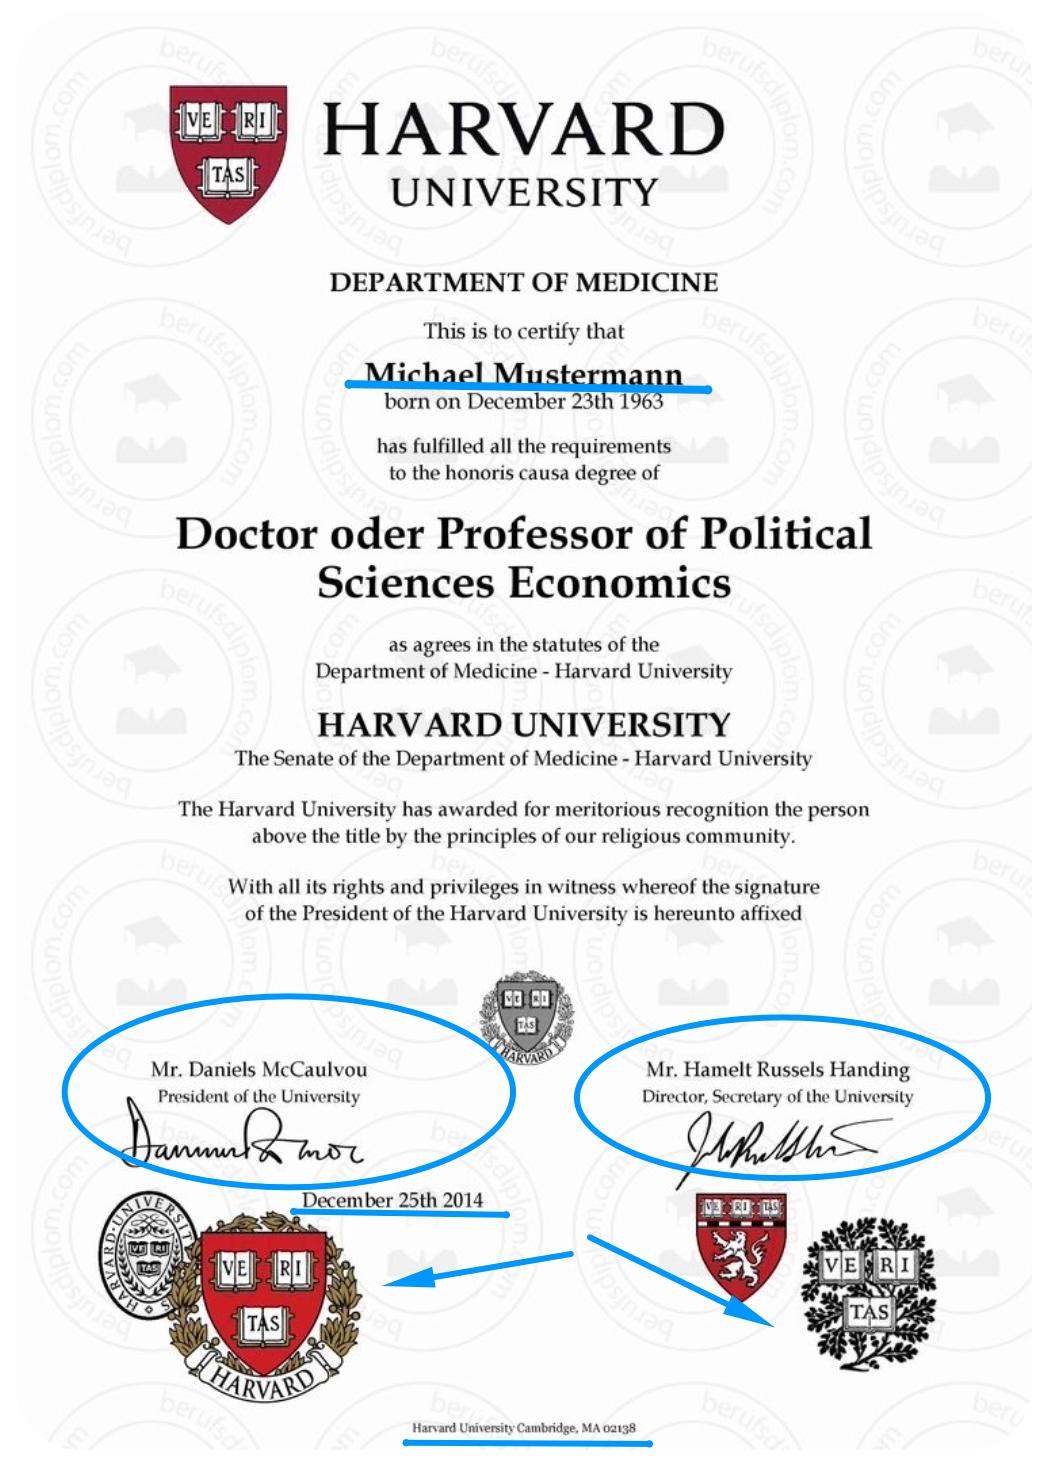 Harvard University certificate design